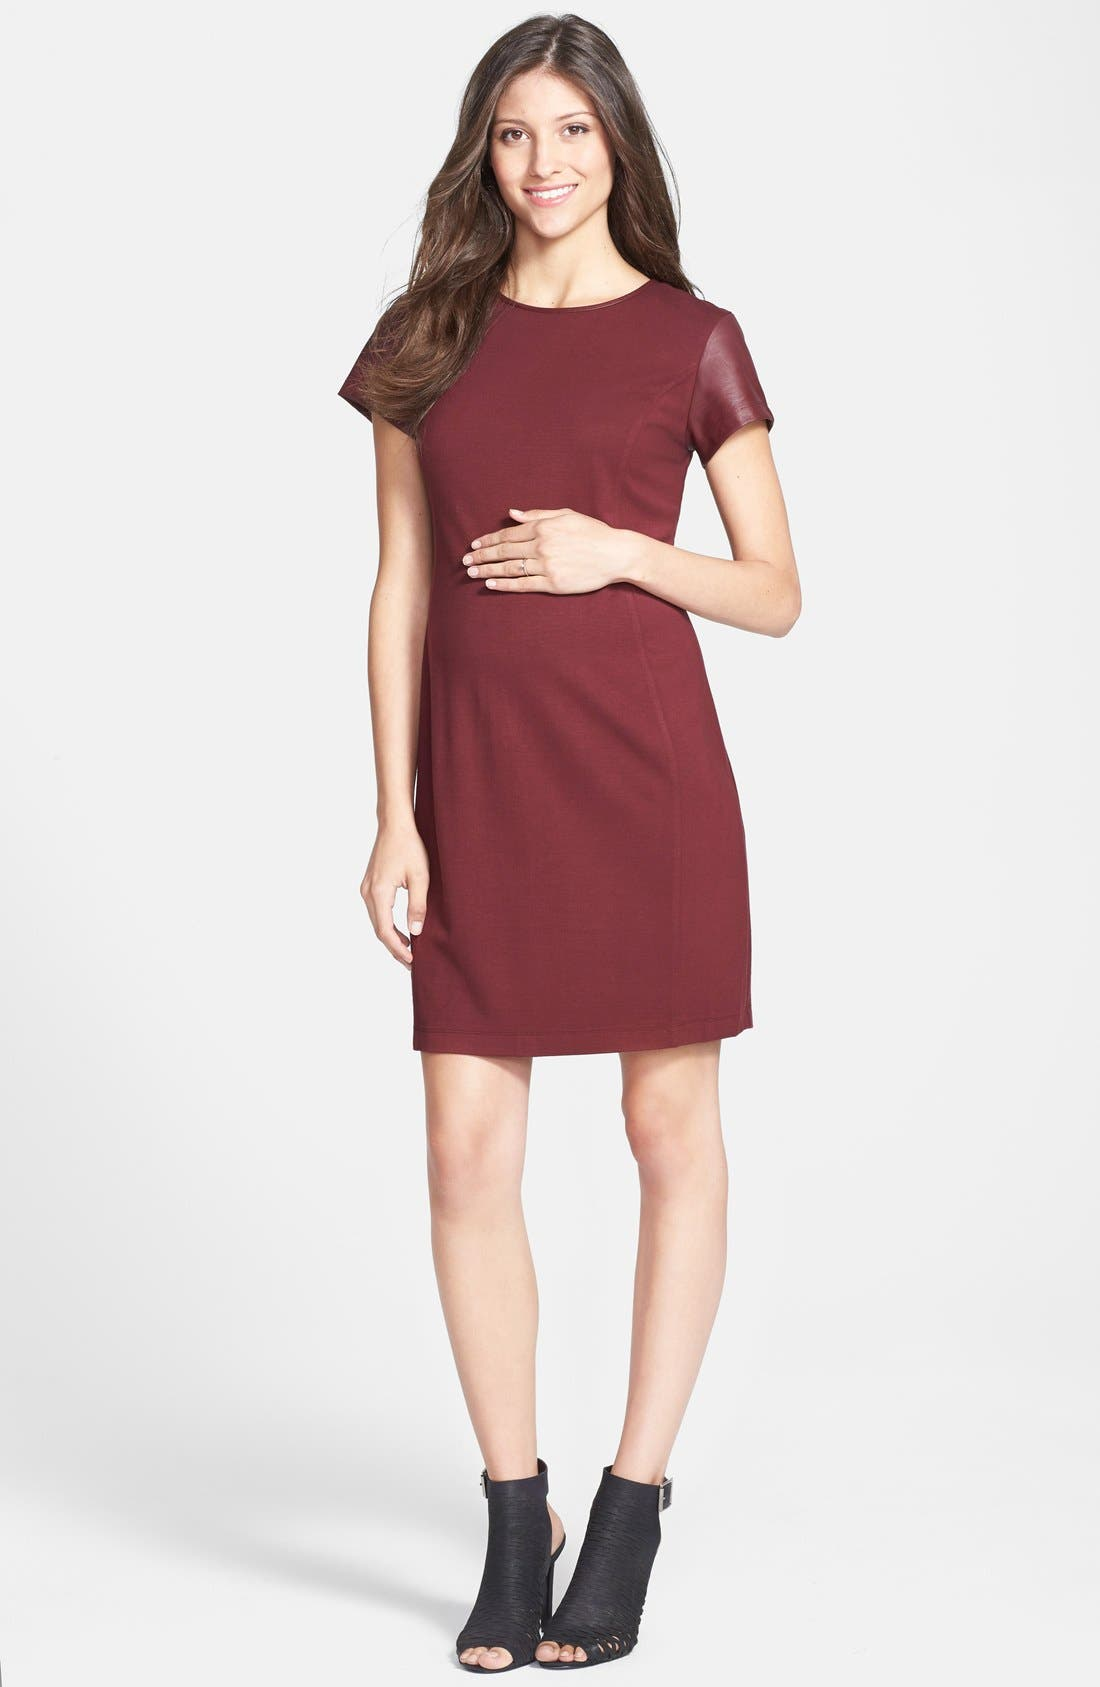 Alternate Image 1 Selected - Tart Maternity 'Braidy' Faux Leather Sleeve Maternity Dress